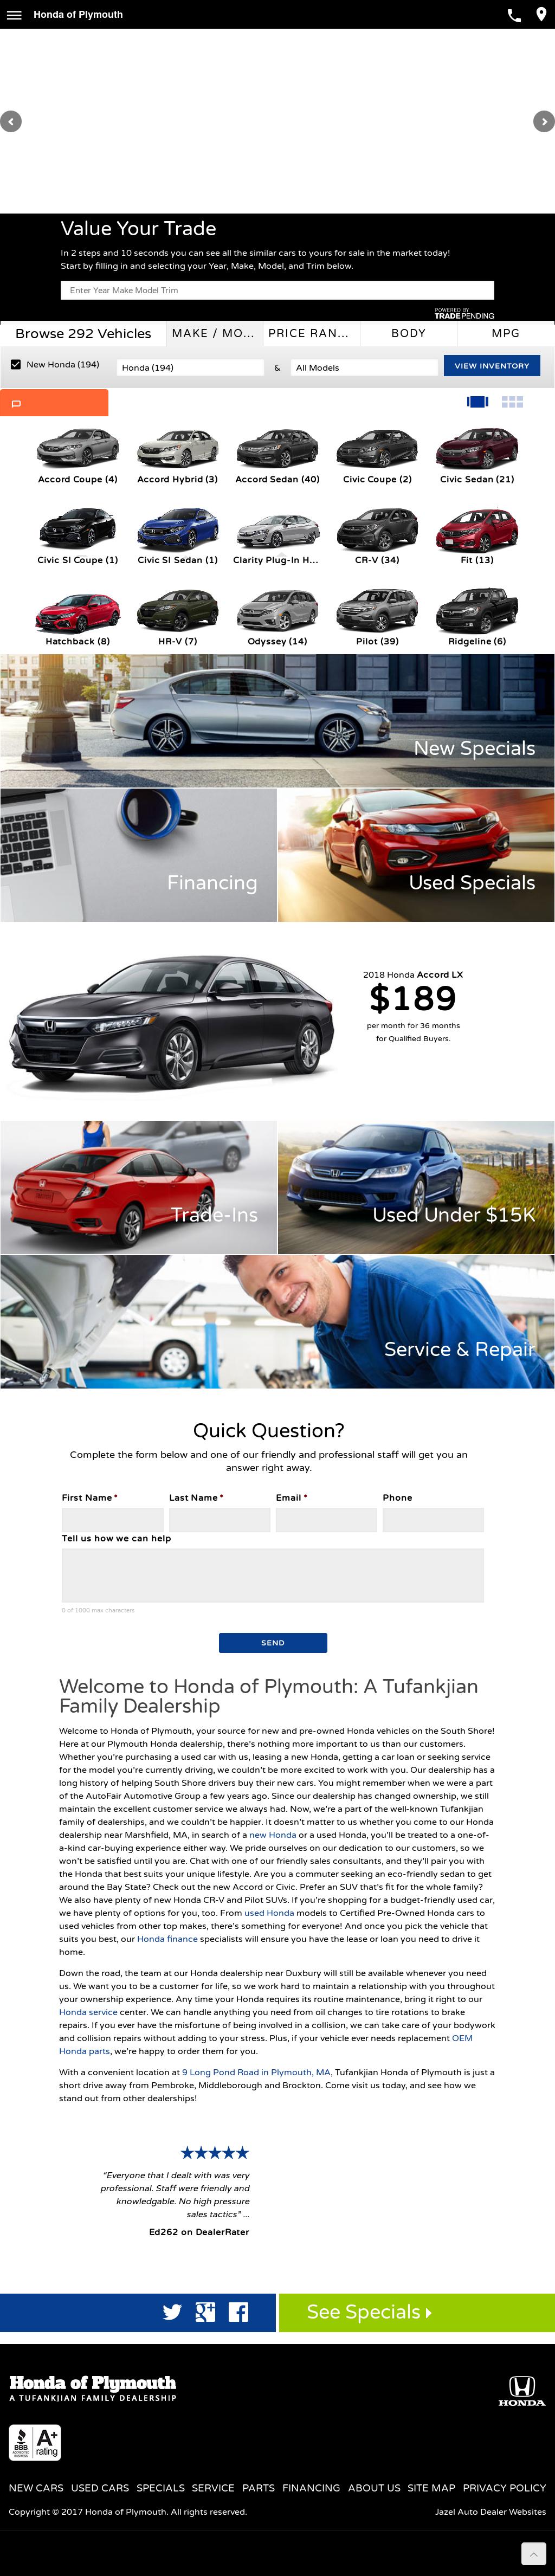 AutoFair Honda Of Plymouth Website History